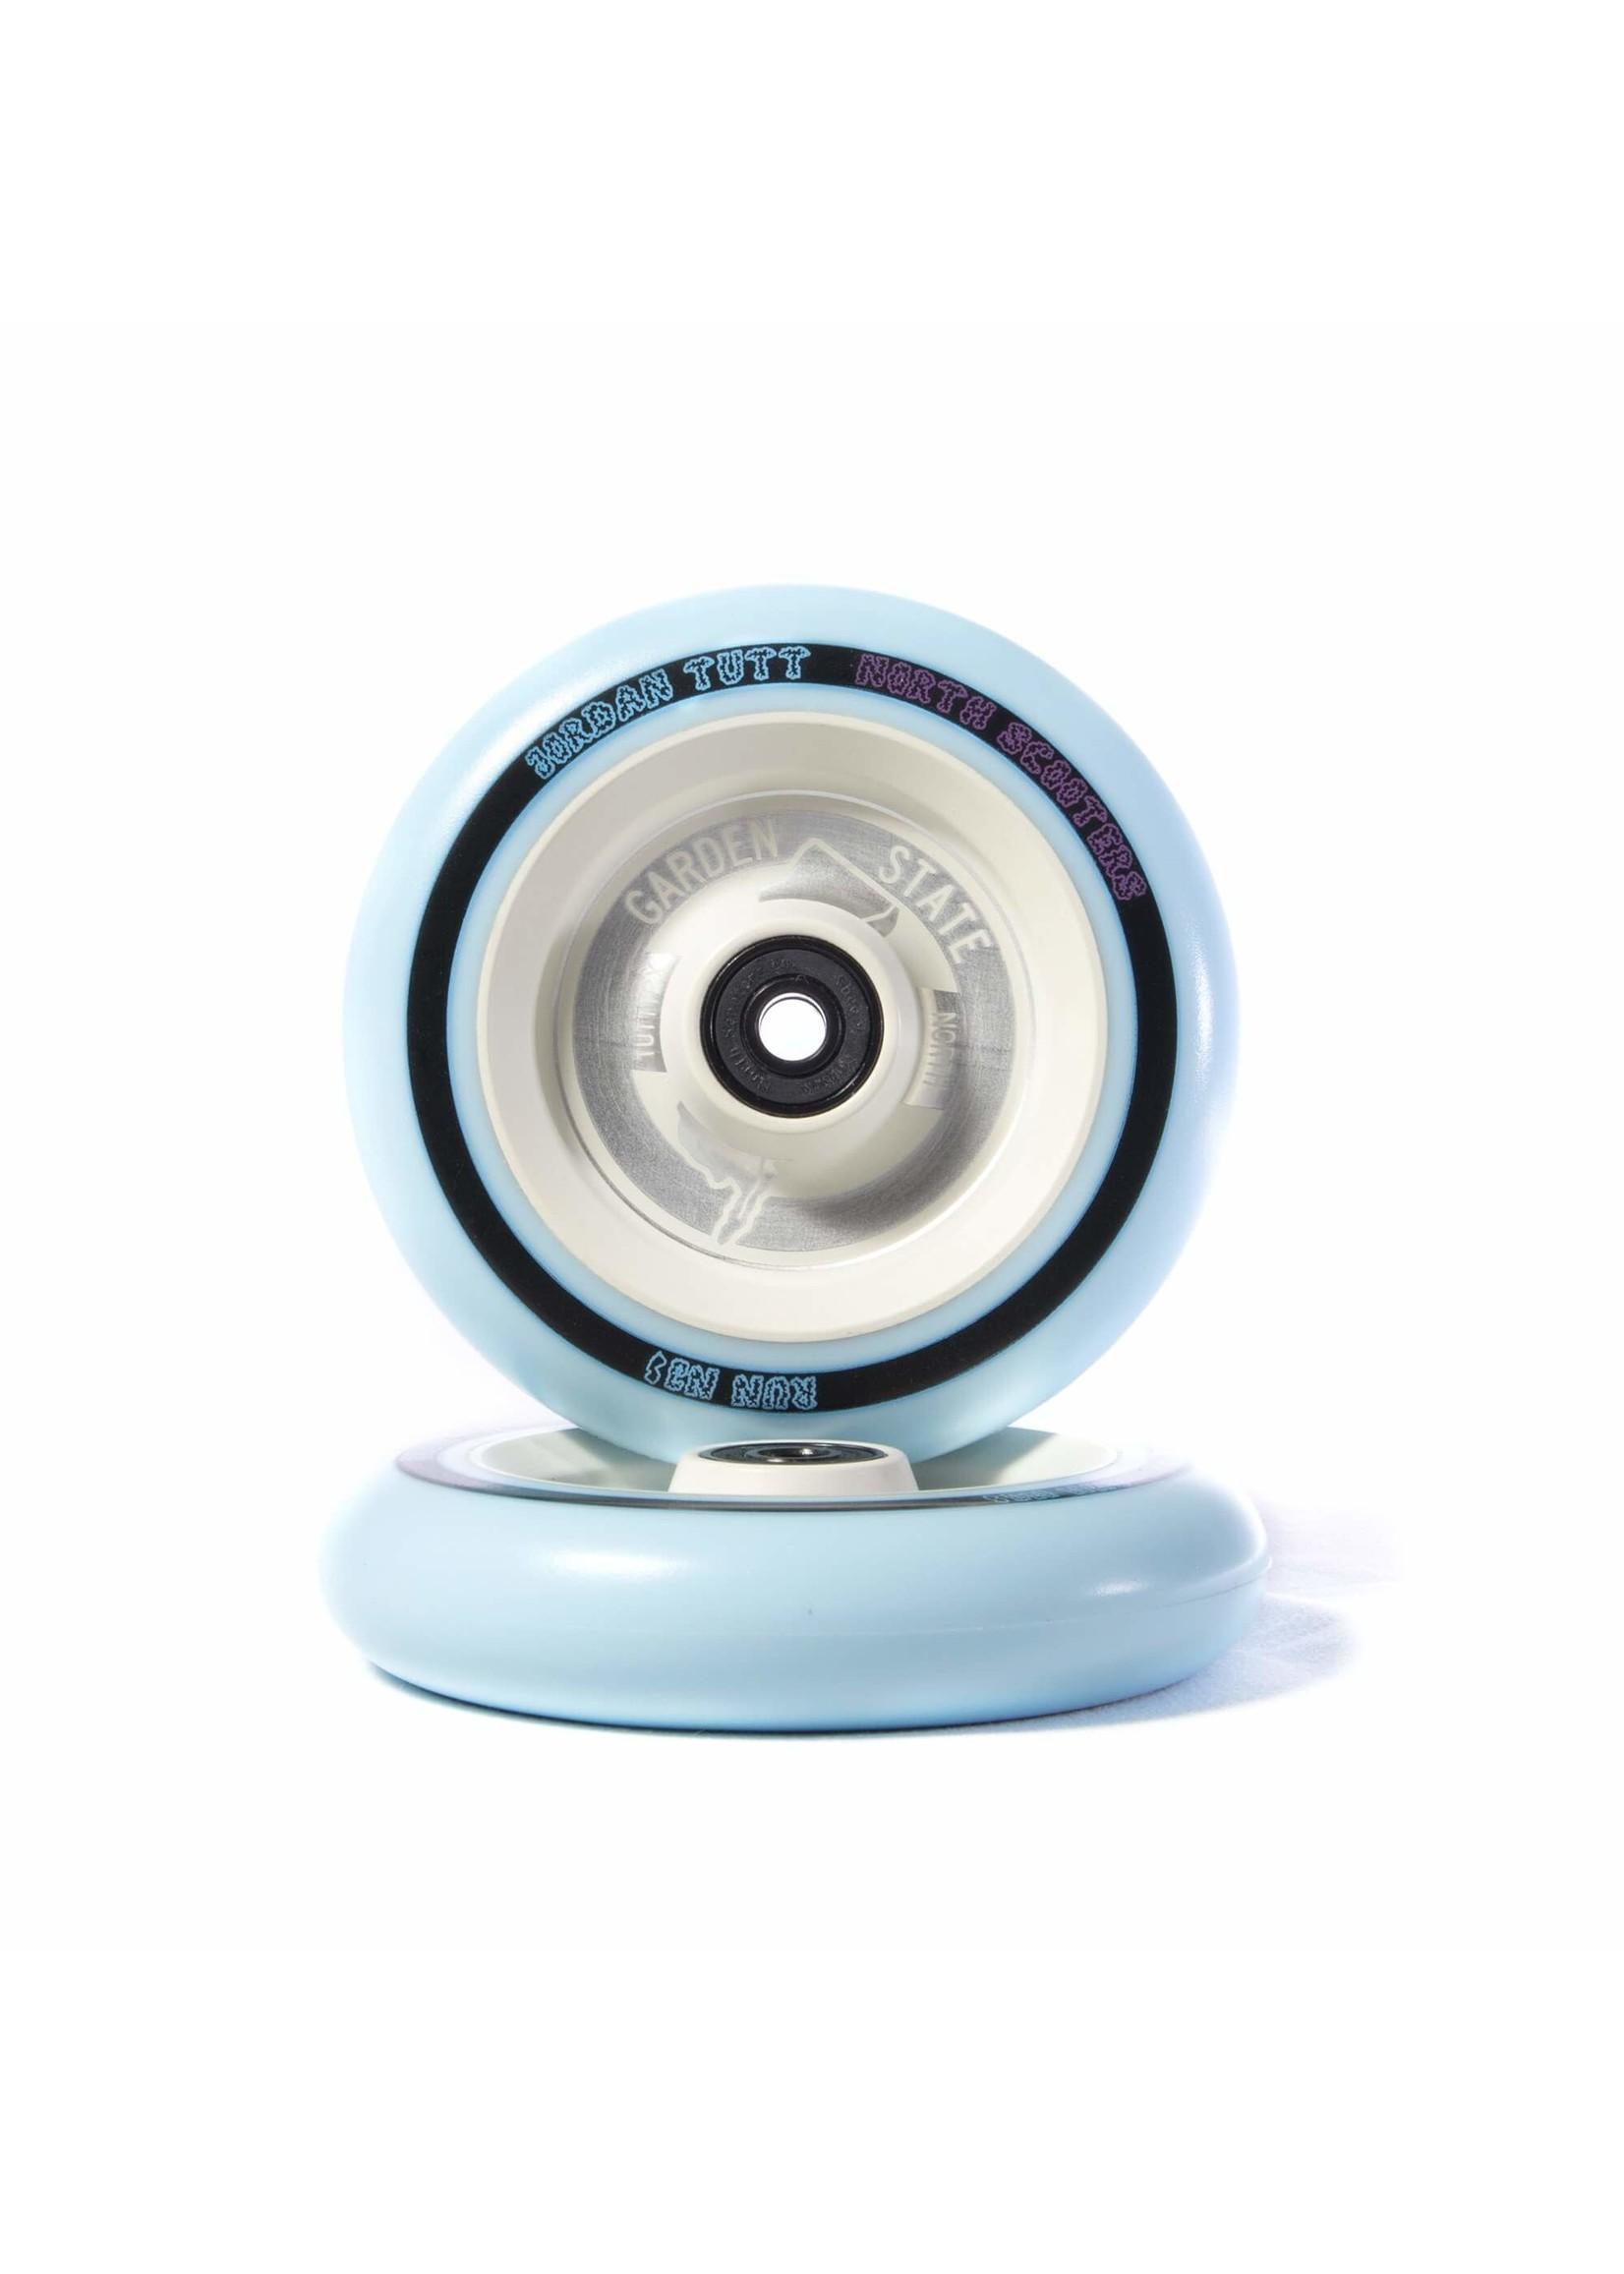 North North - Jordan Tutt Sig Wheel - 110x24mm